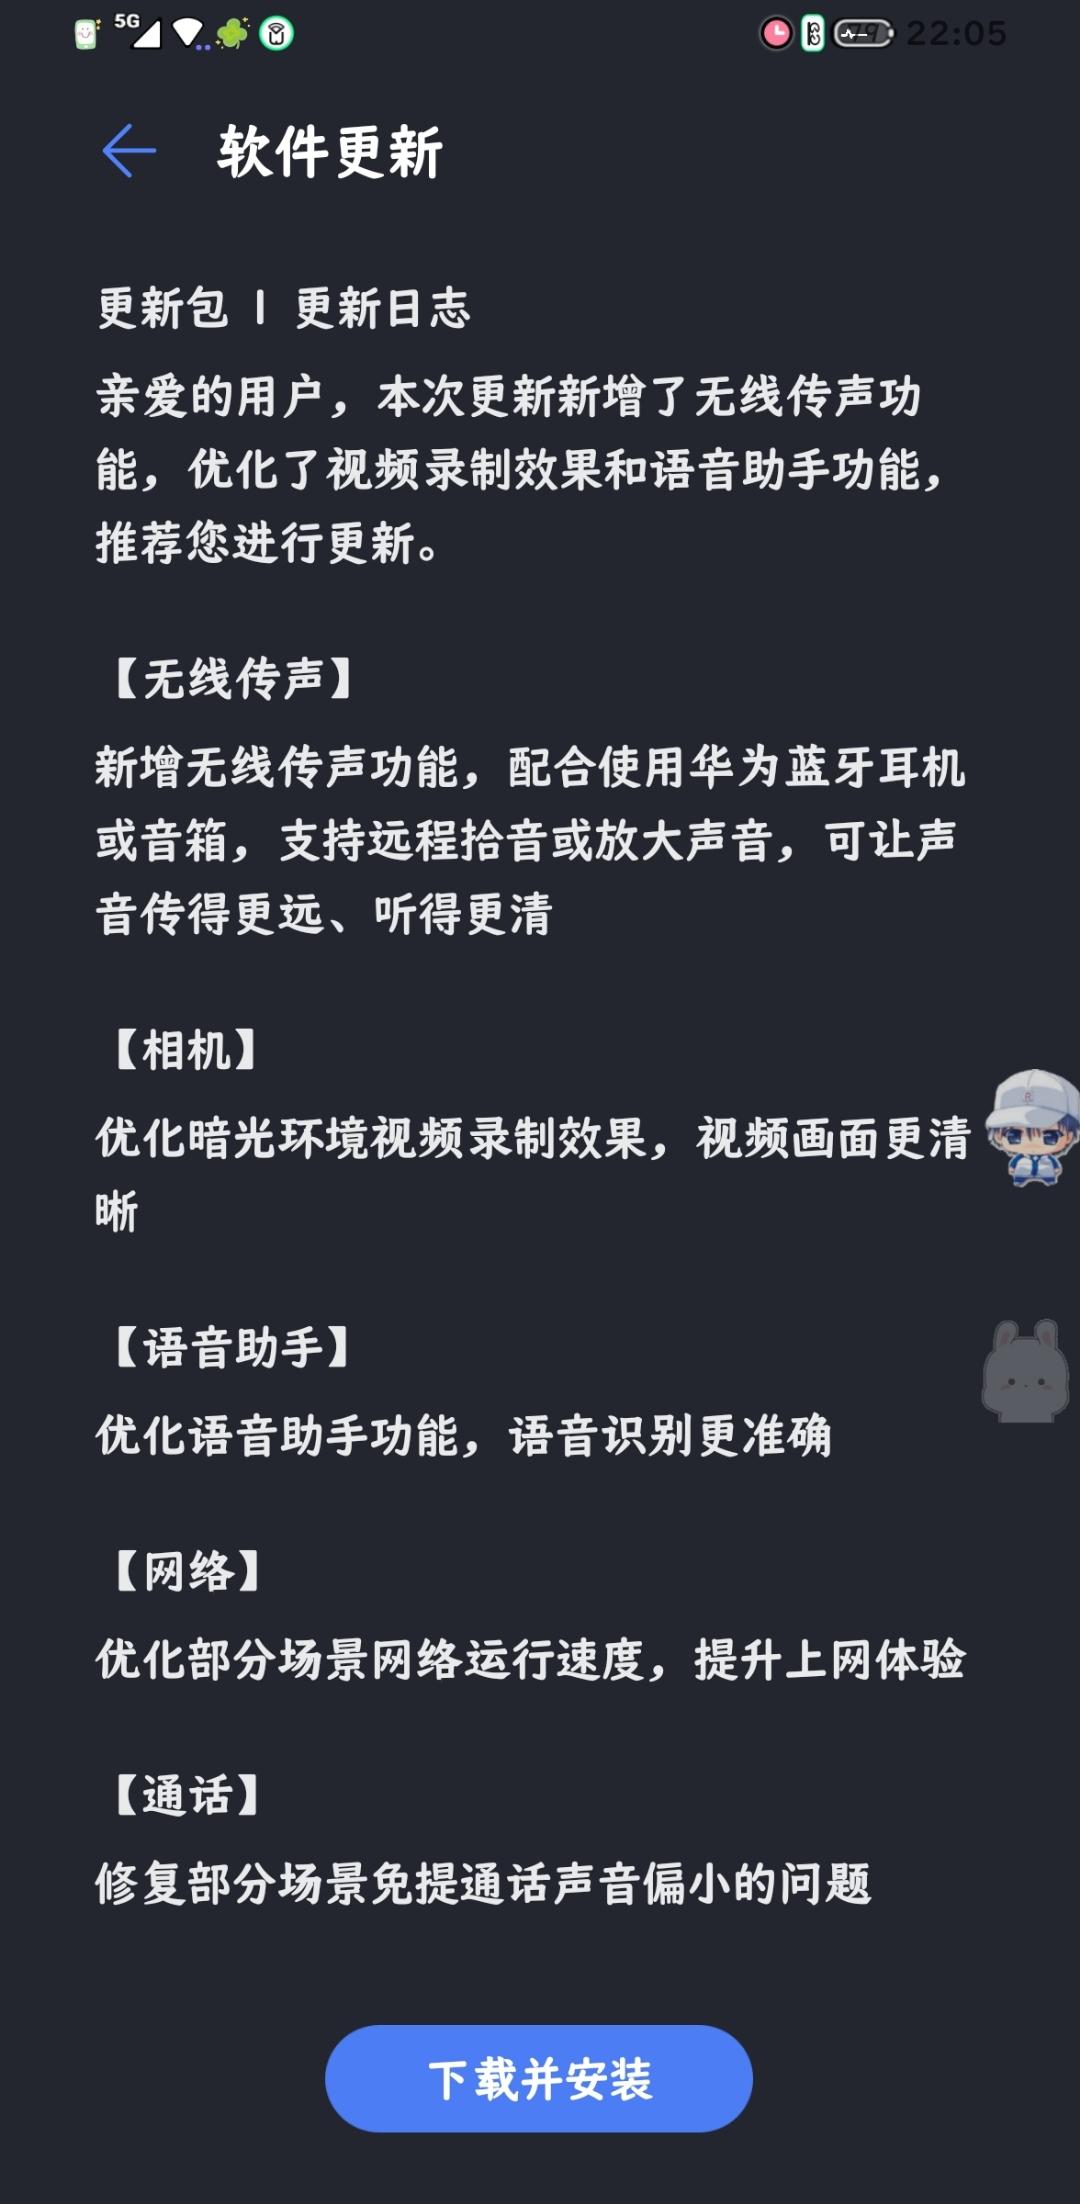 Screenshot_20200512_220511_com.huawei.android.hwouc.jpg